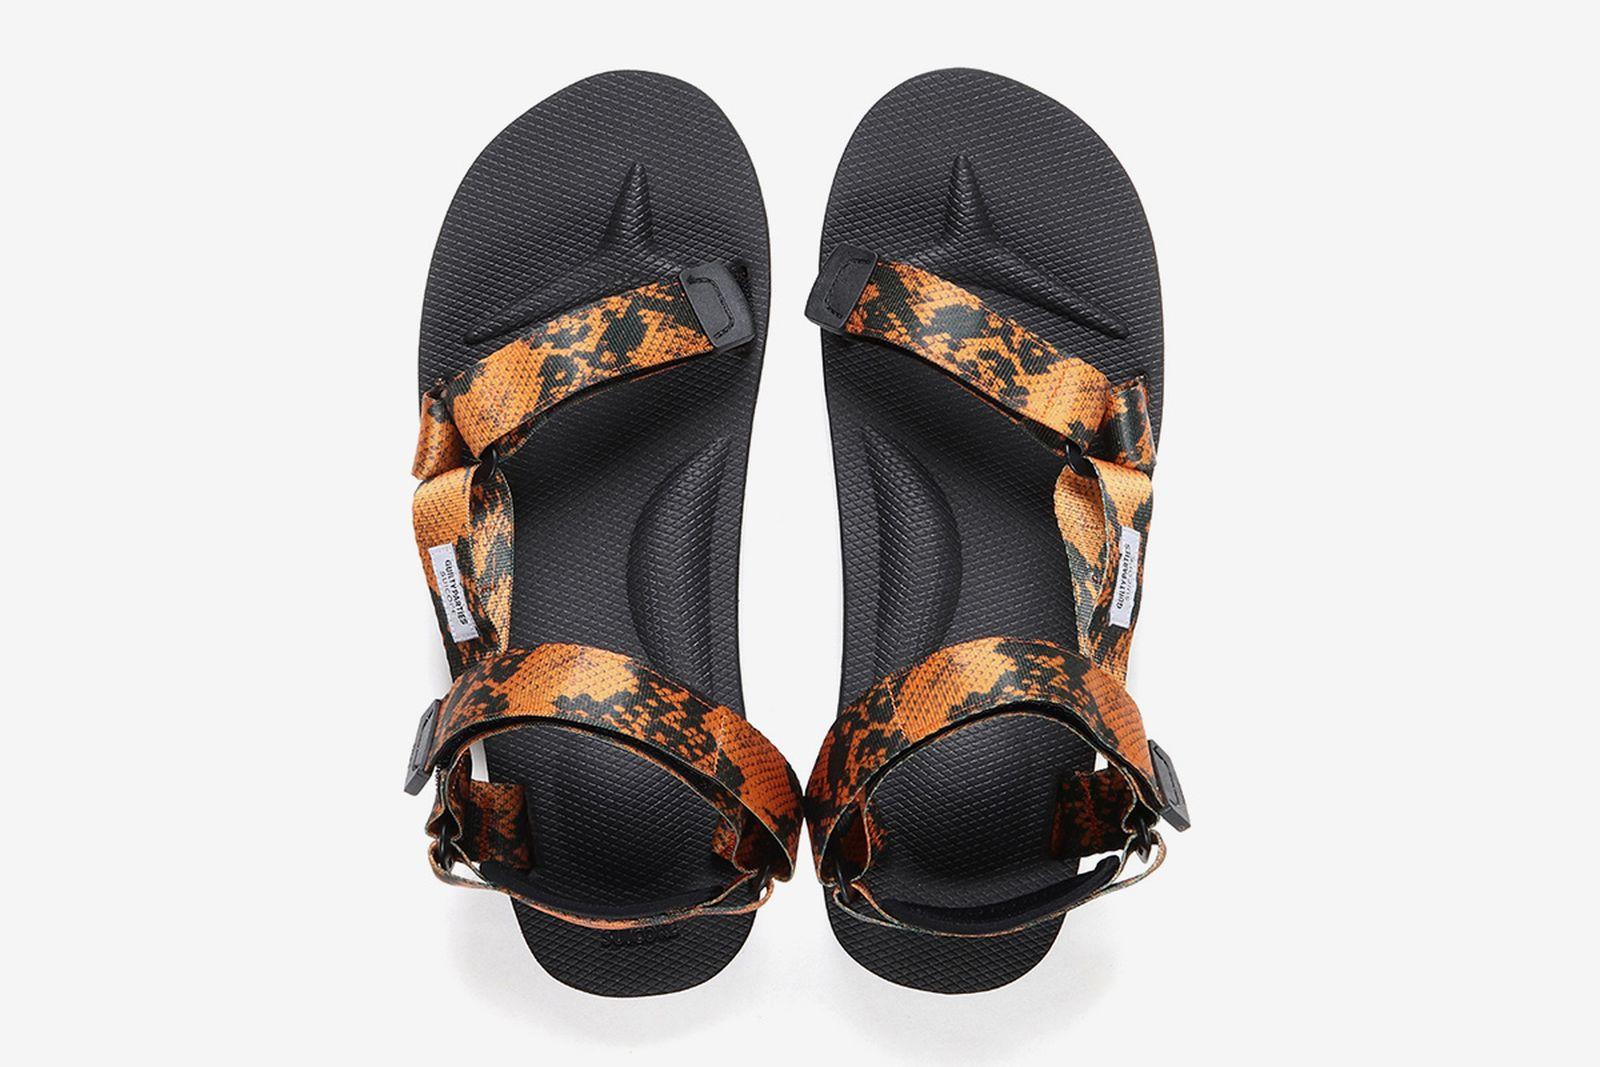 wacko-maria-suicoke-sandals-release-date-price-02